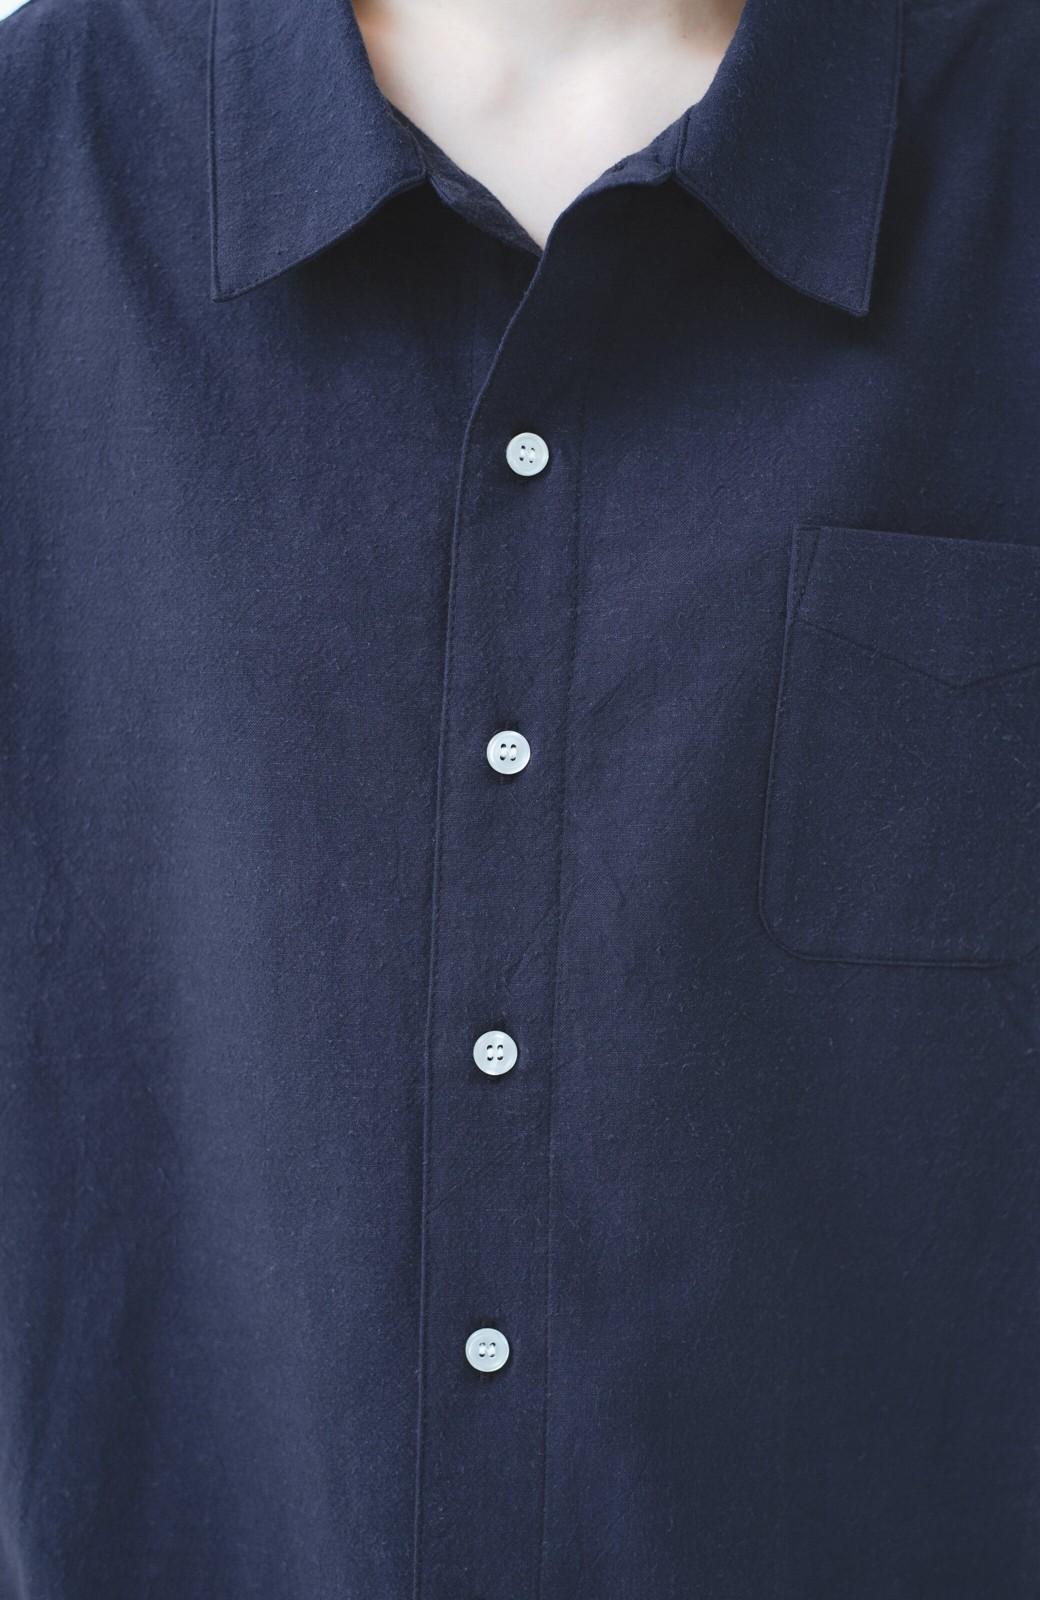 haco! PBP オーガニックコットン 母モコトの上下別々で普段も着られる 綿麻パジャマ <ネイビー>の商品写真4